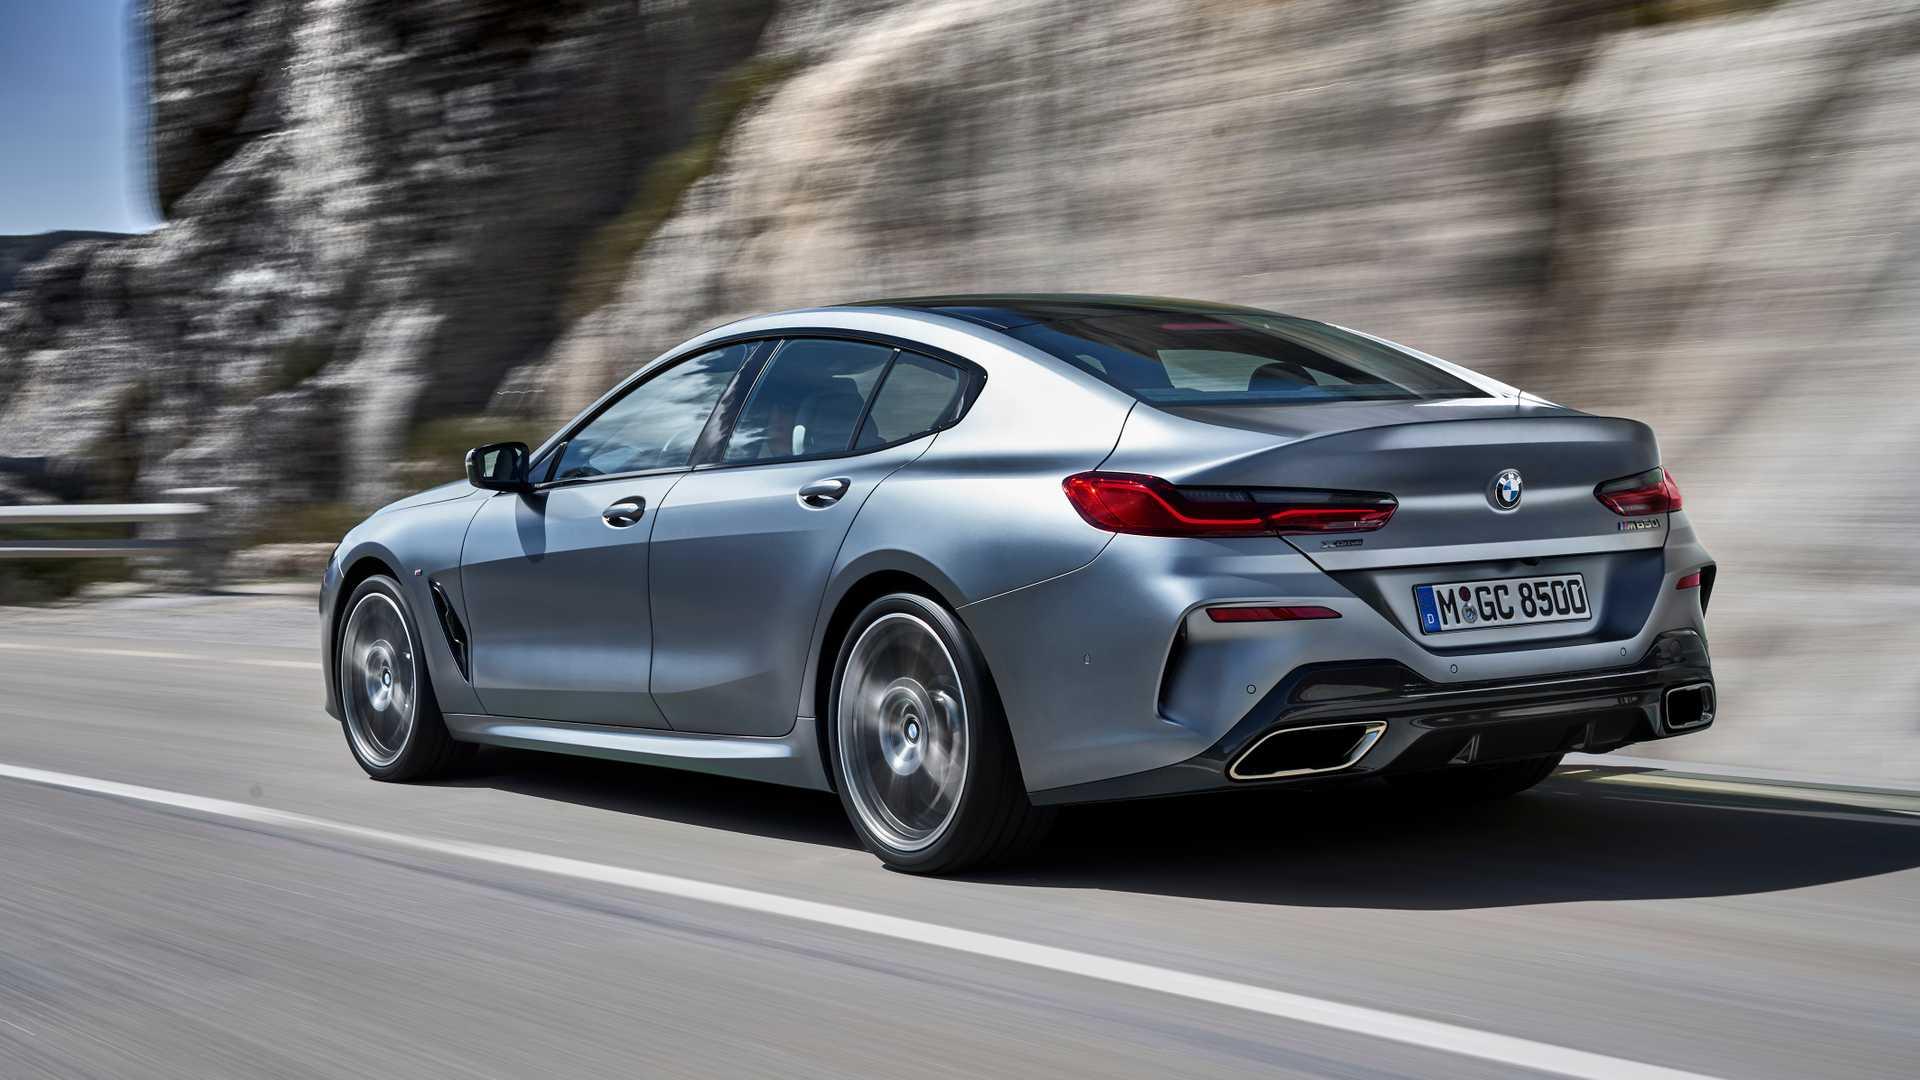 bmw-serie-8-gran-coupe-2020 (7)